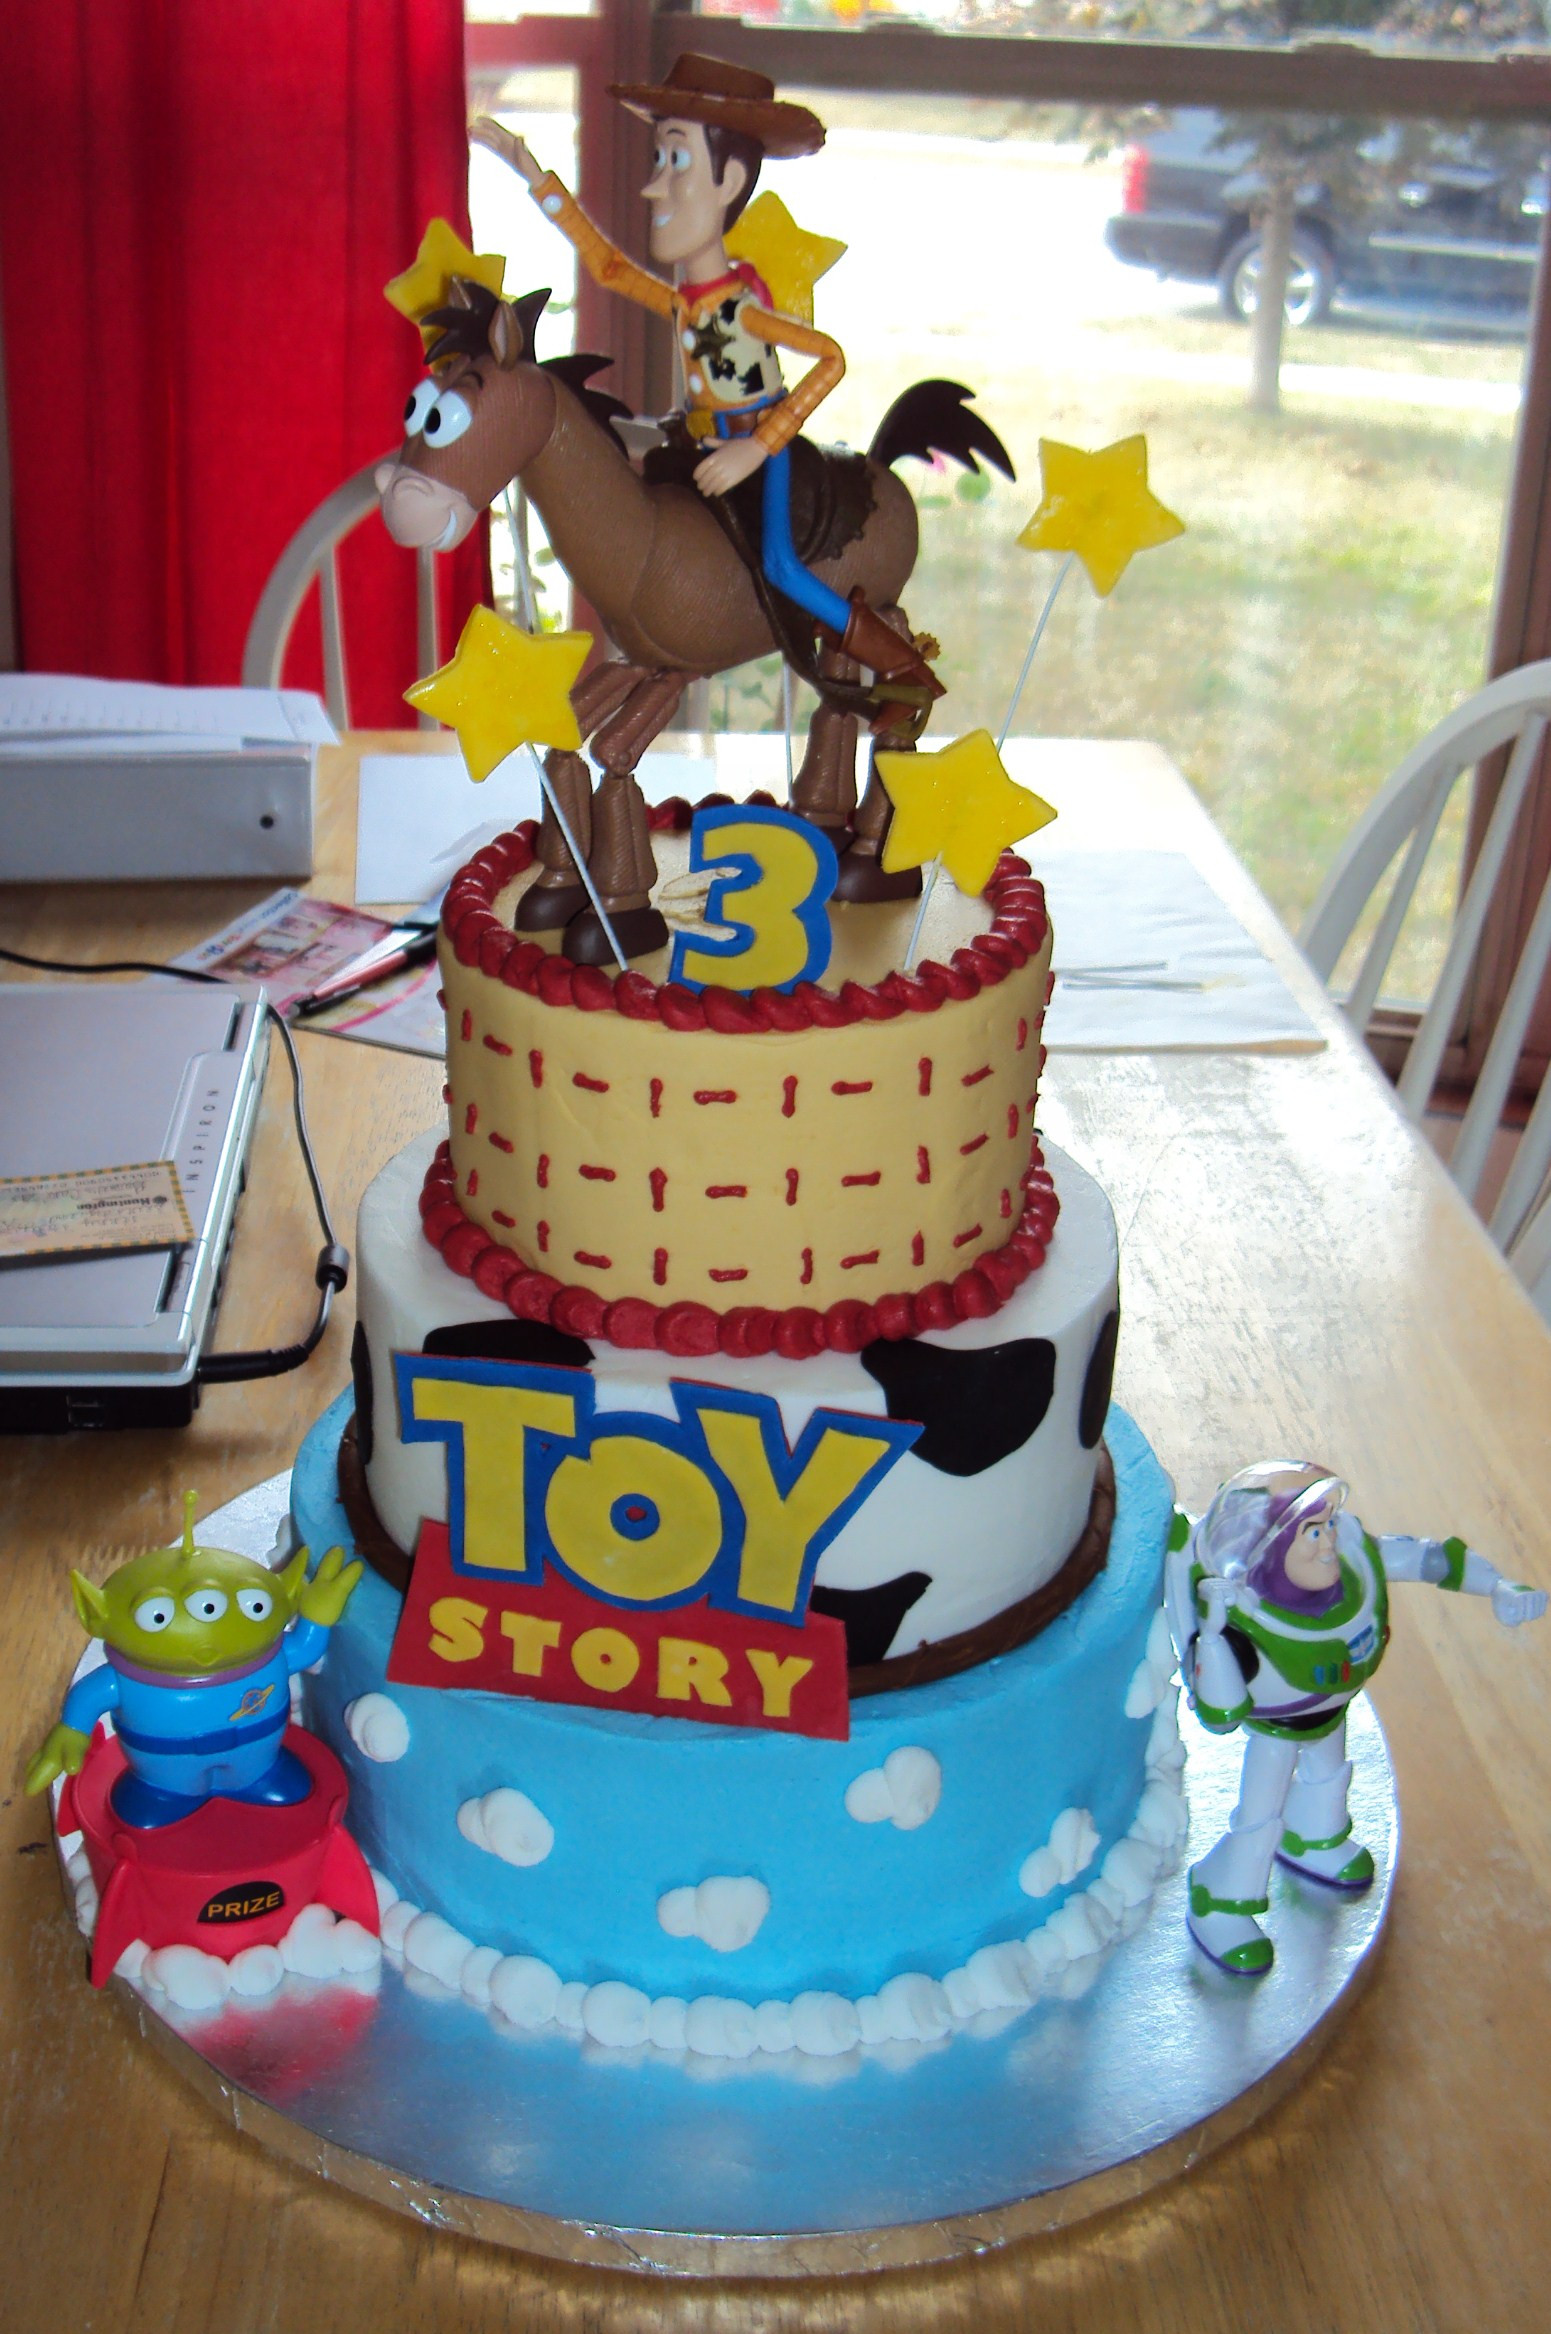 Toy Story Birthday Cakes Ideas  Toy Story Cakes – Decoration Ideas